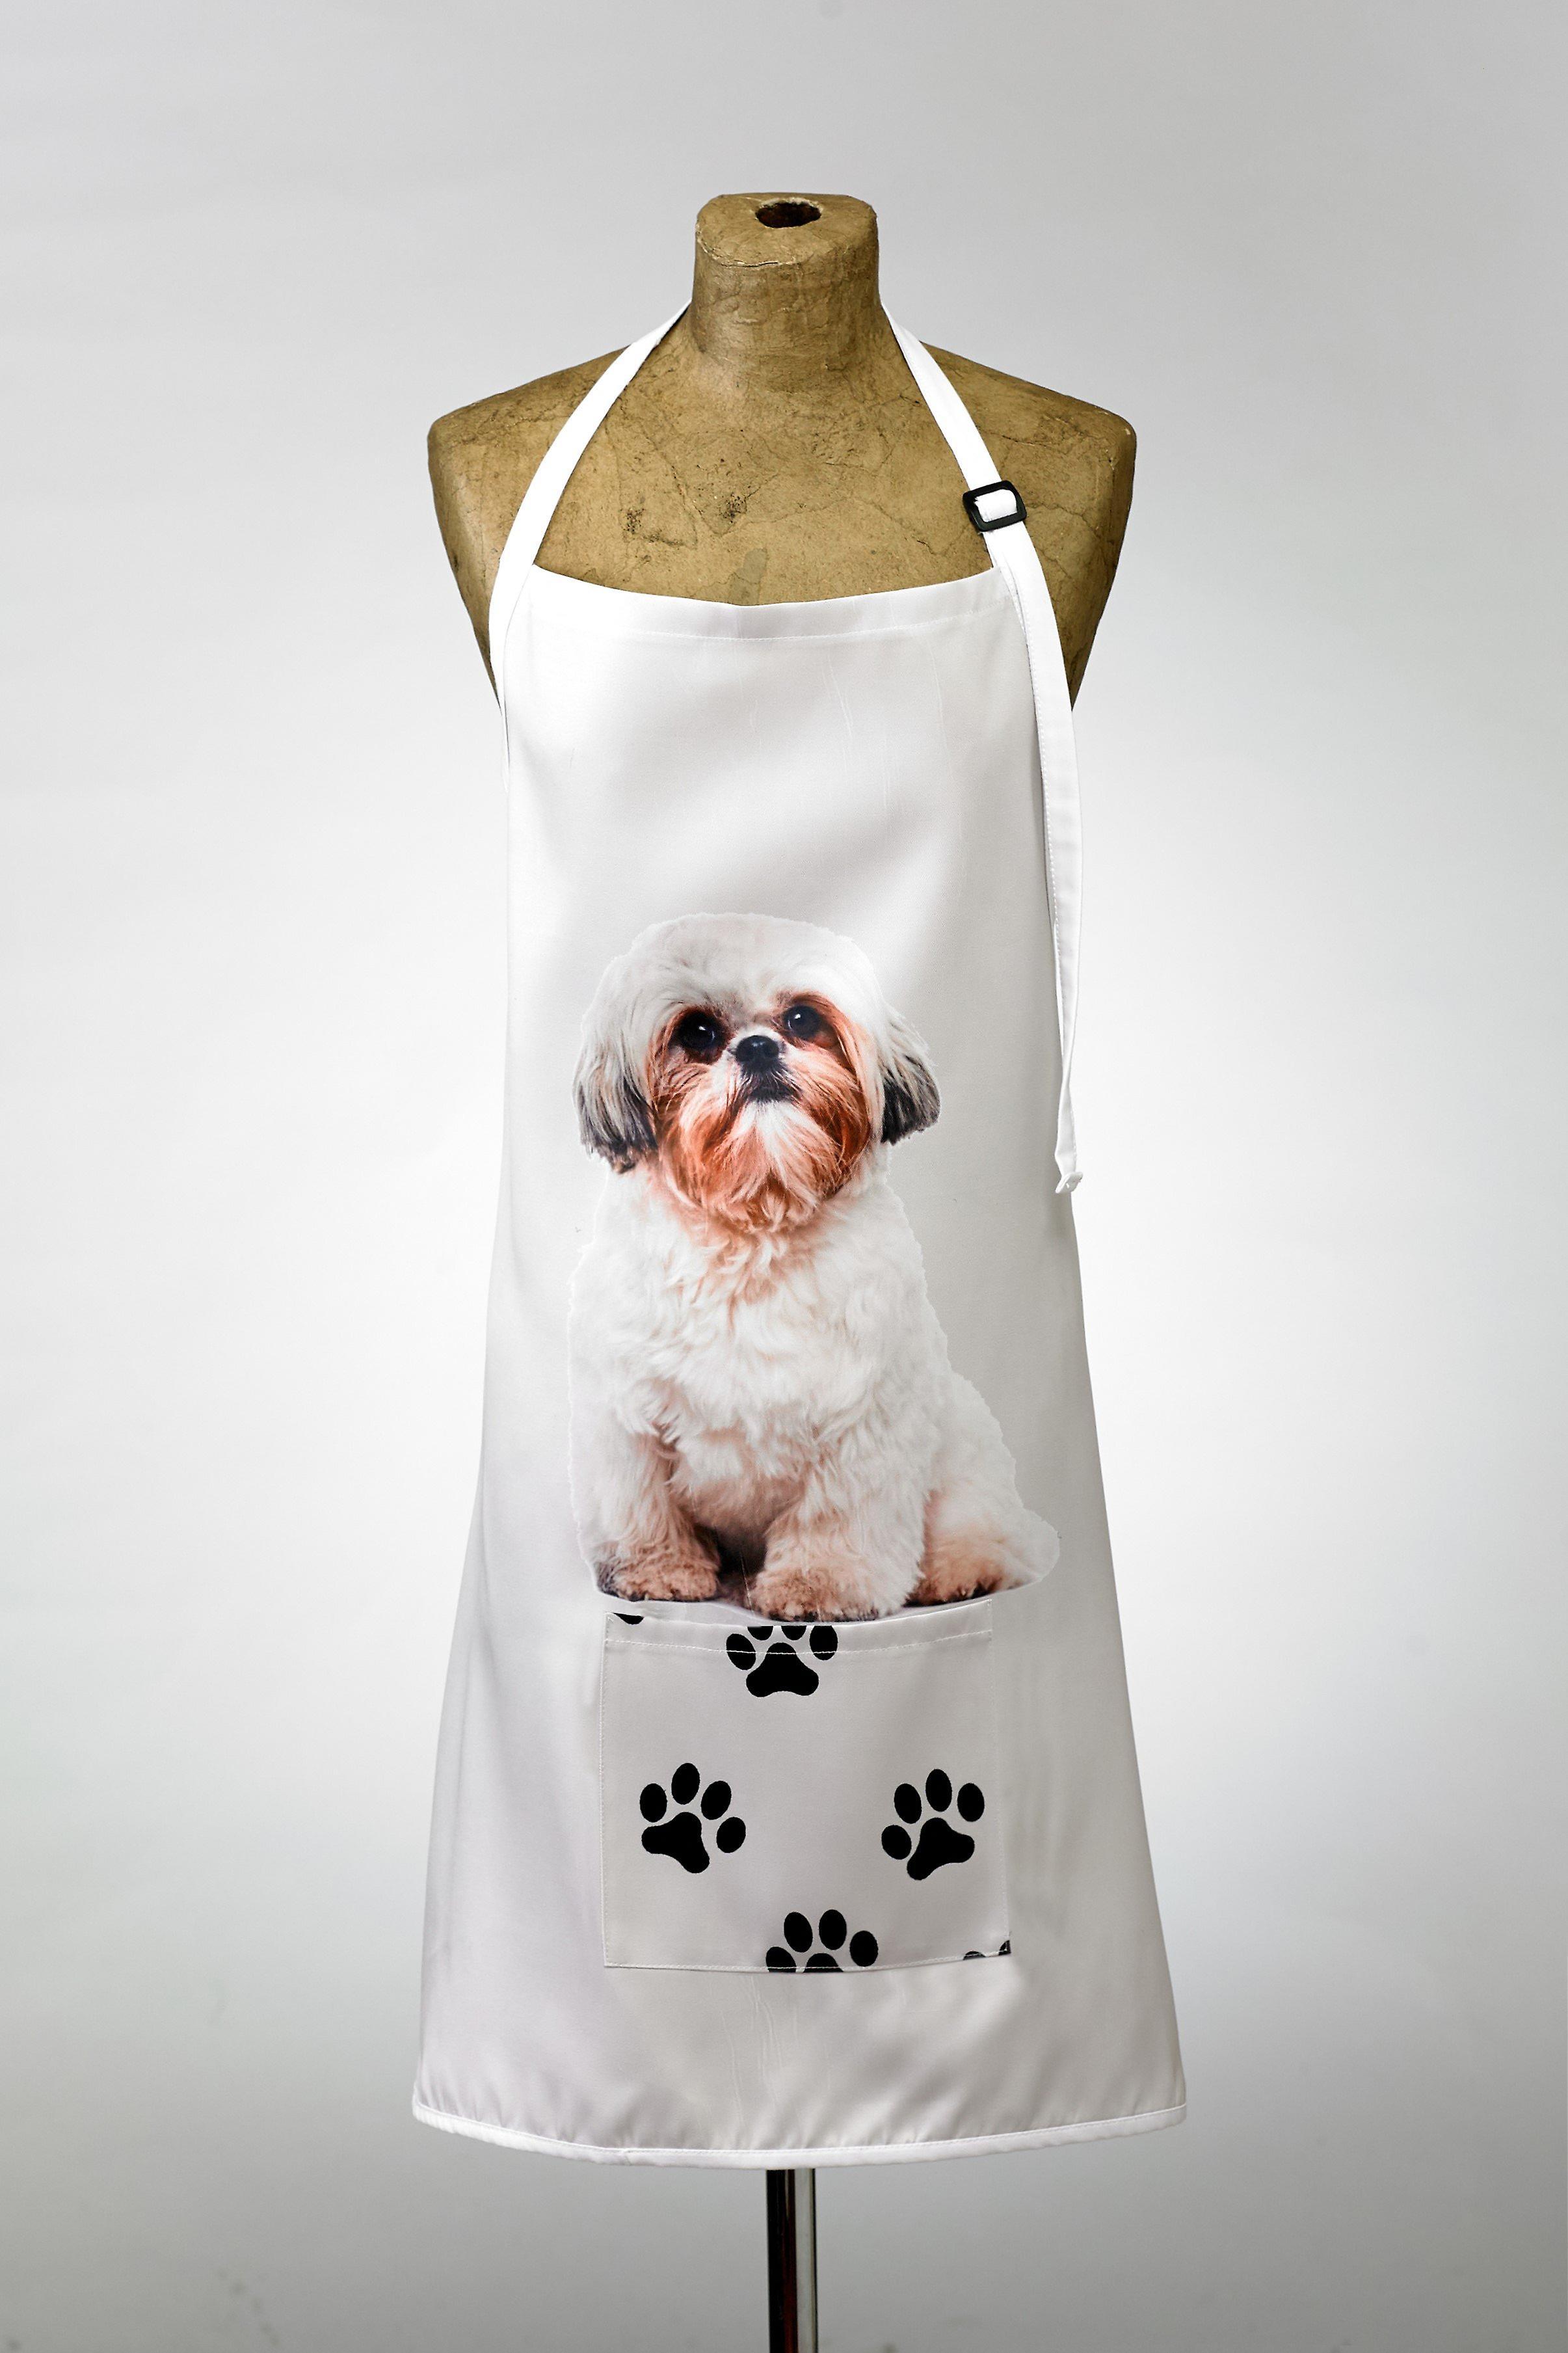 Adorable shih tzu design apron